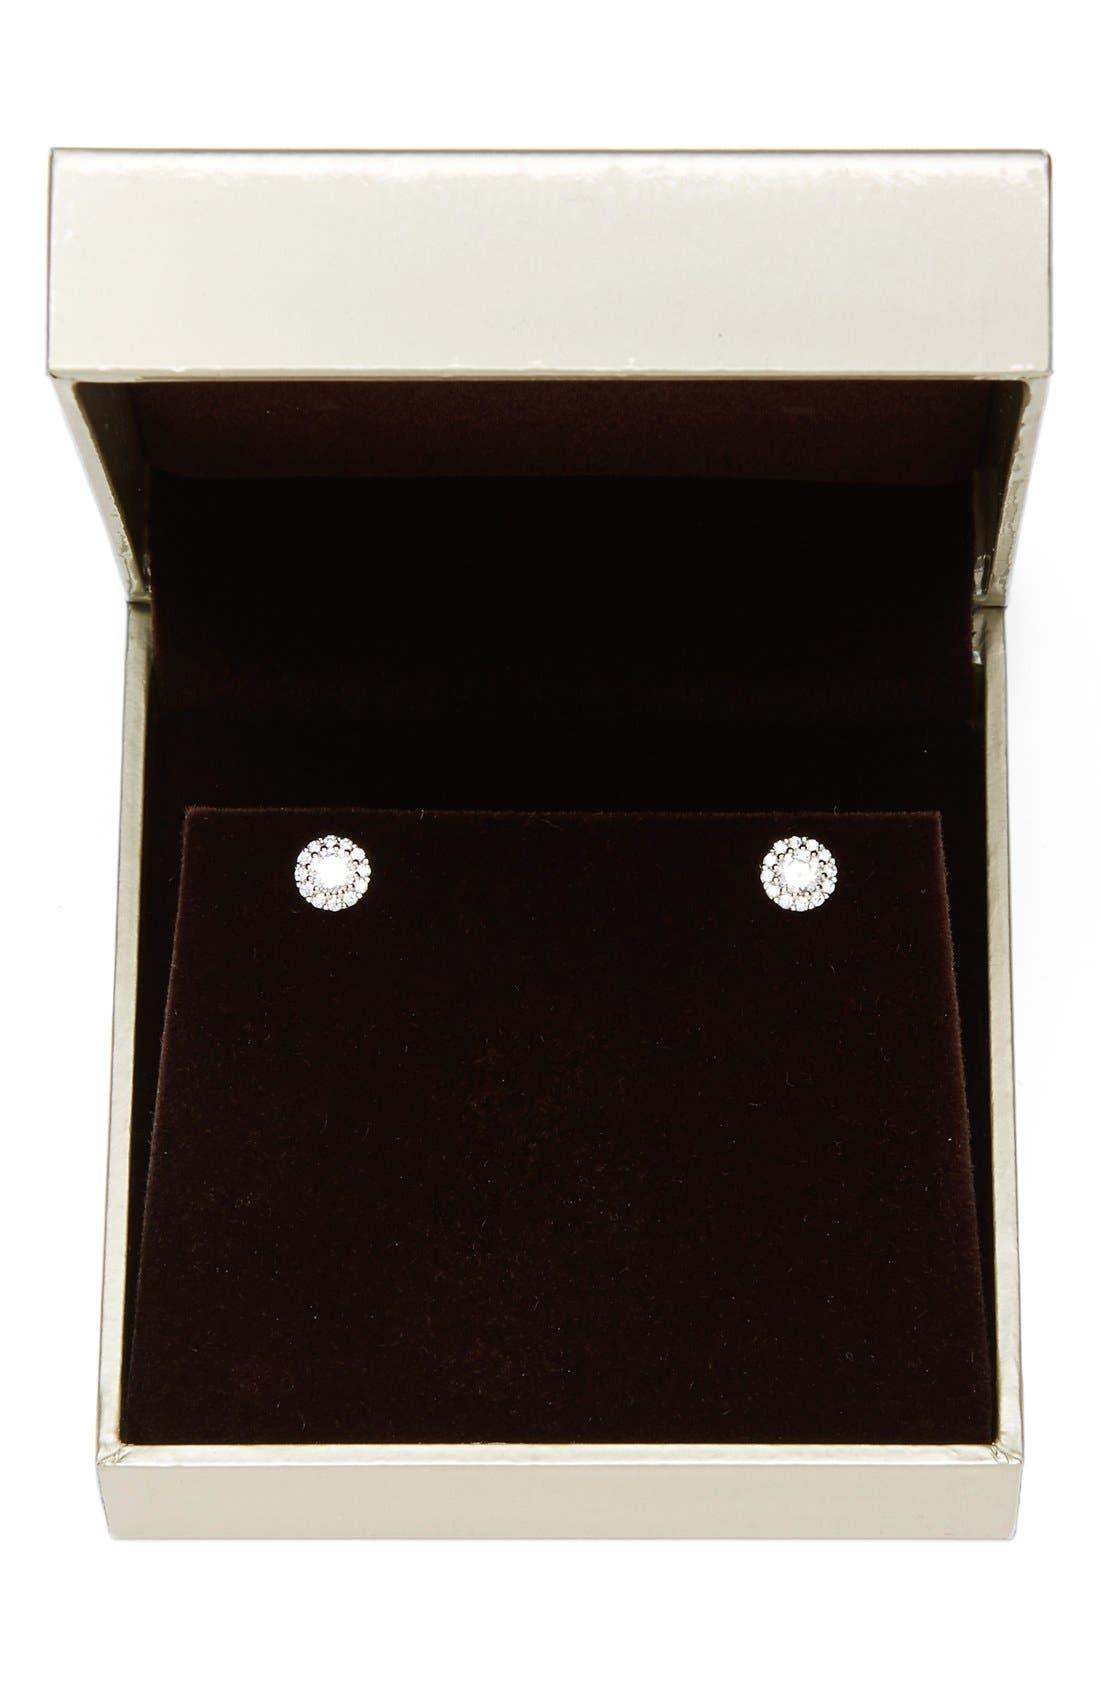 NORDSTROM, Precious Metal Plated Cubic Zirconia Stud Earrings, Alternate thumbnail 2, color, PLATINUM